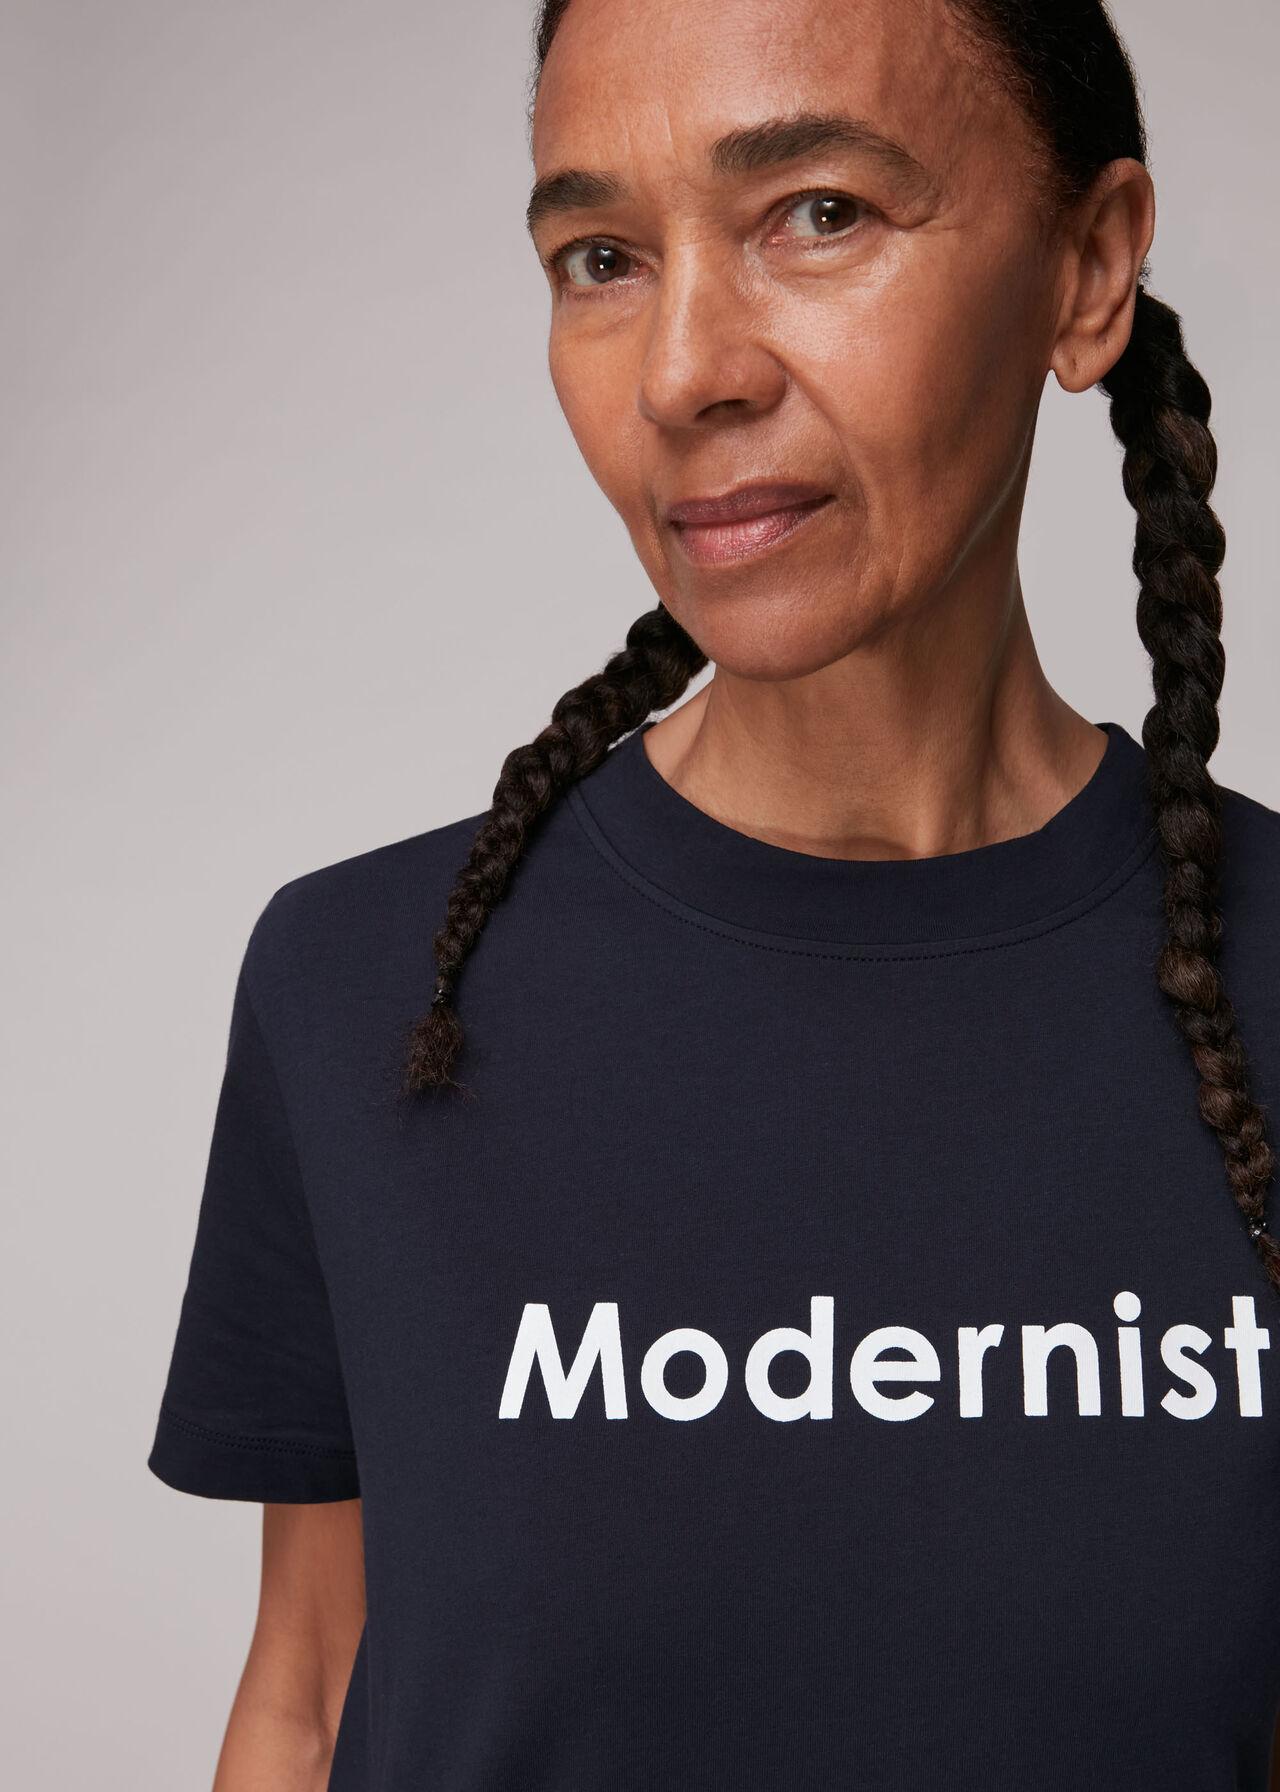 Modernist Logo Tshirt